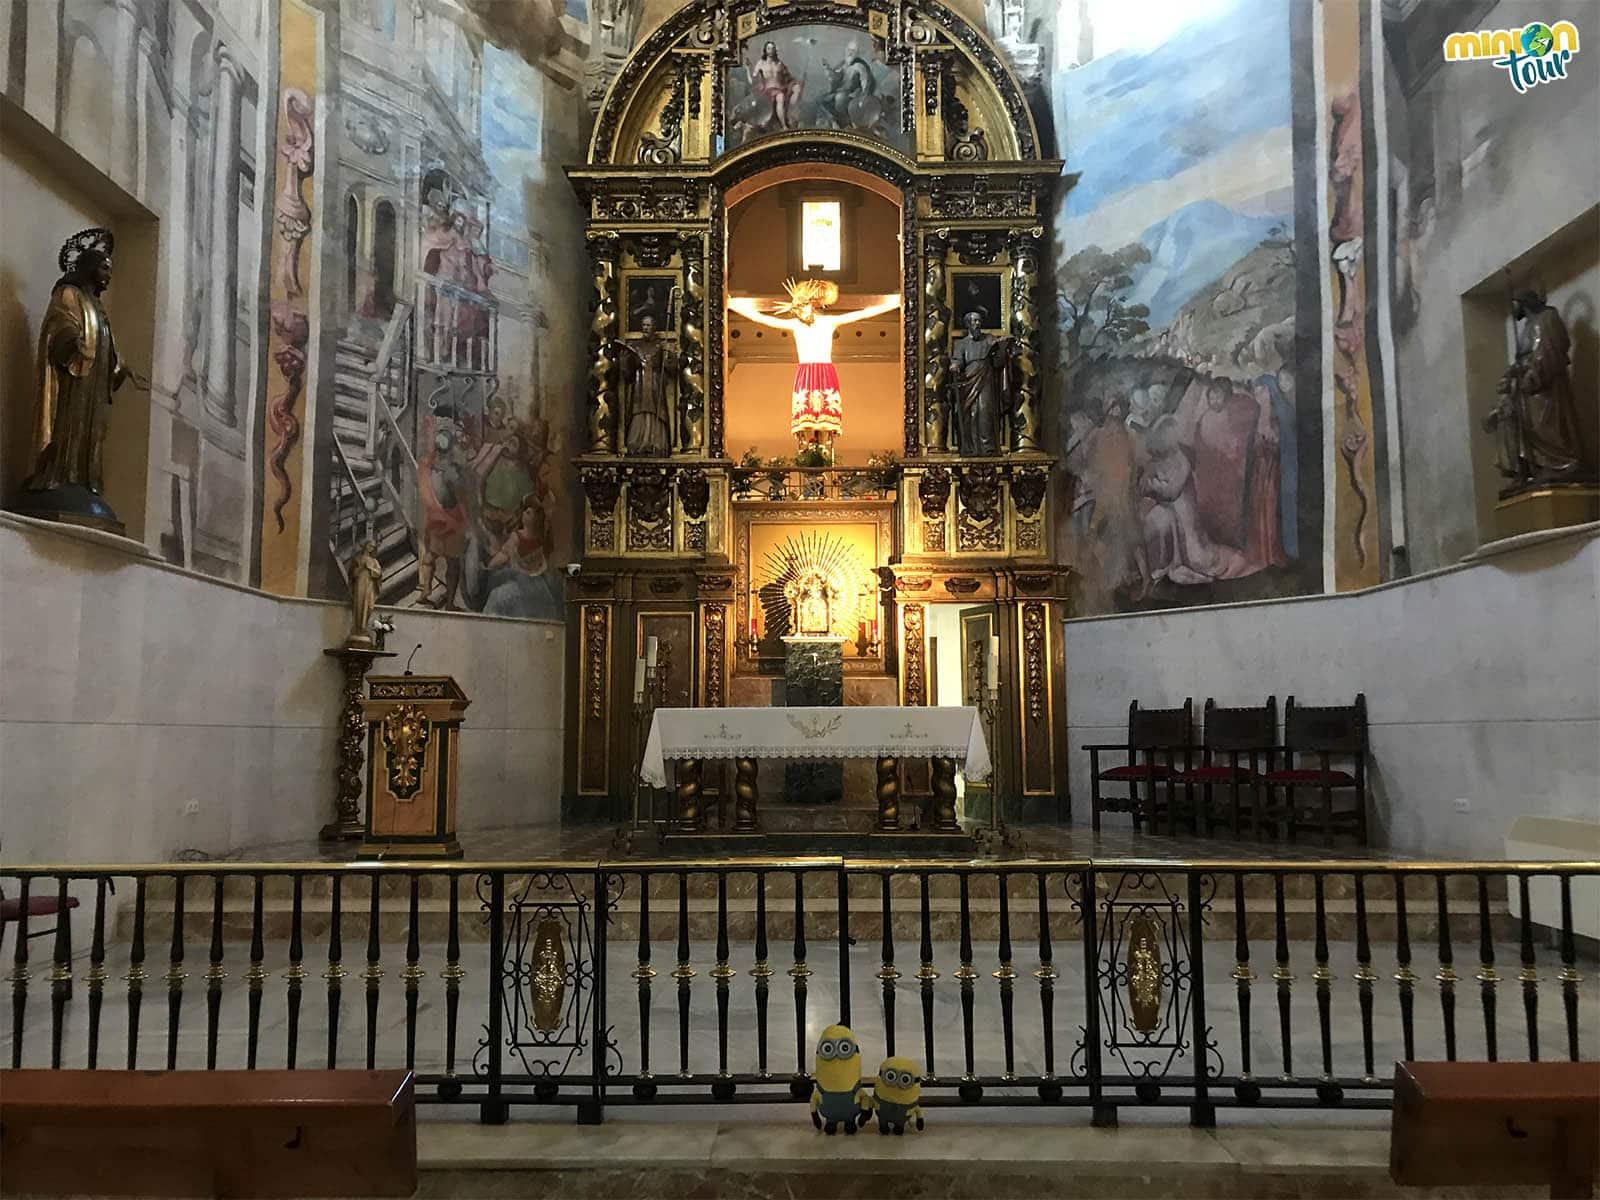 Saludando al Santísimo Cristo de la Sangre en Torrijos